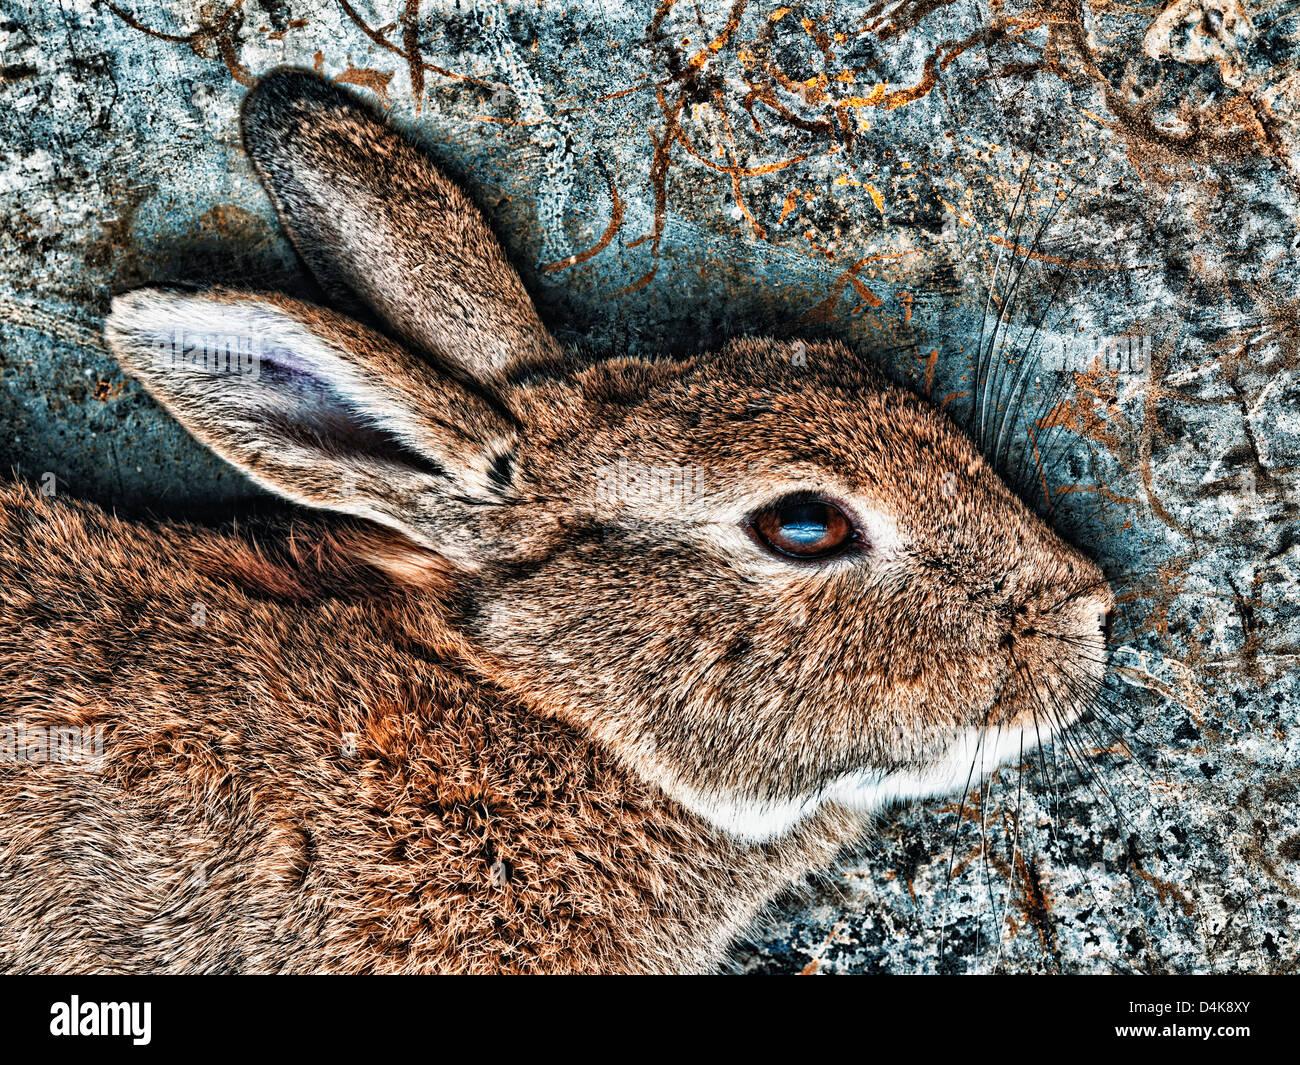 Close up of rabbit's face Stock Photo